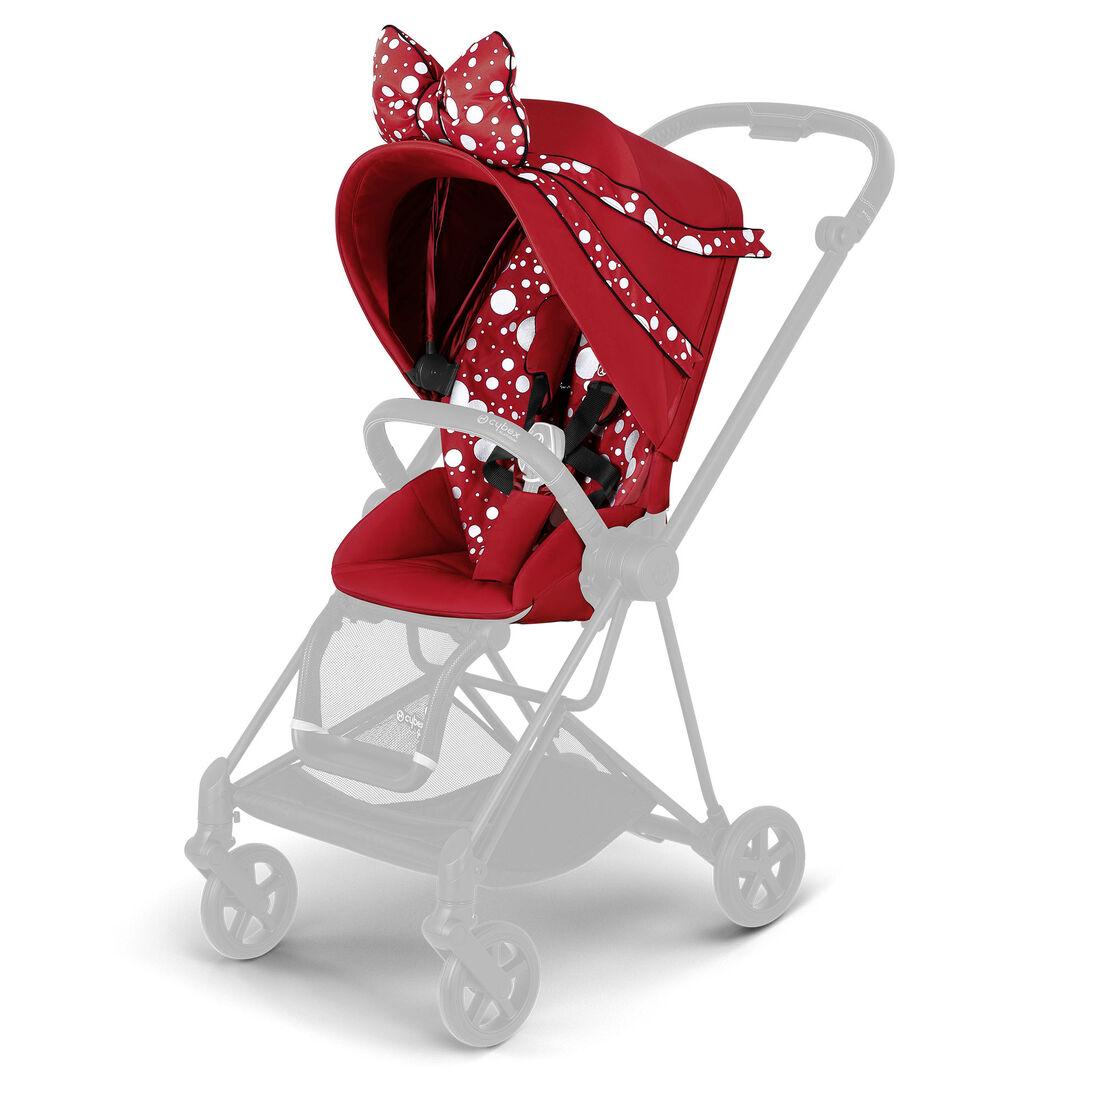 CYBEX Mios Sitzpaket - Petticoat Red in  large Bild 1